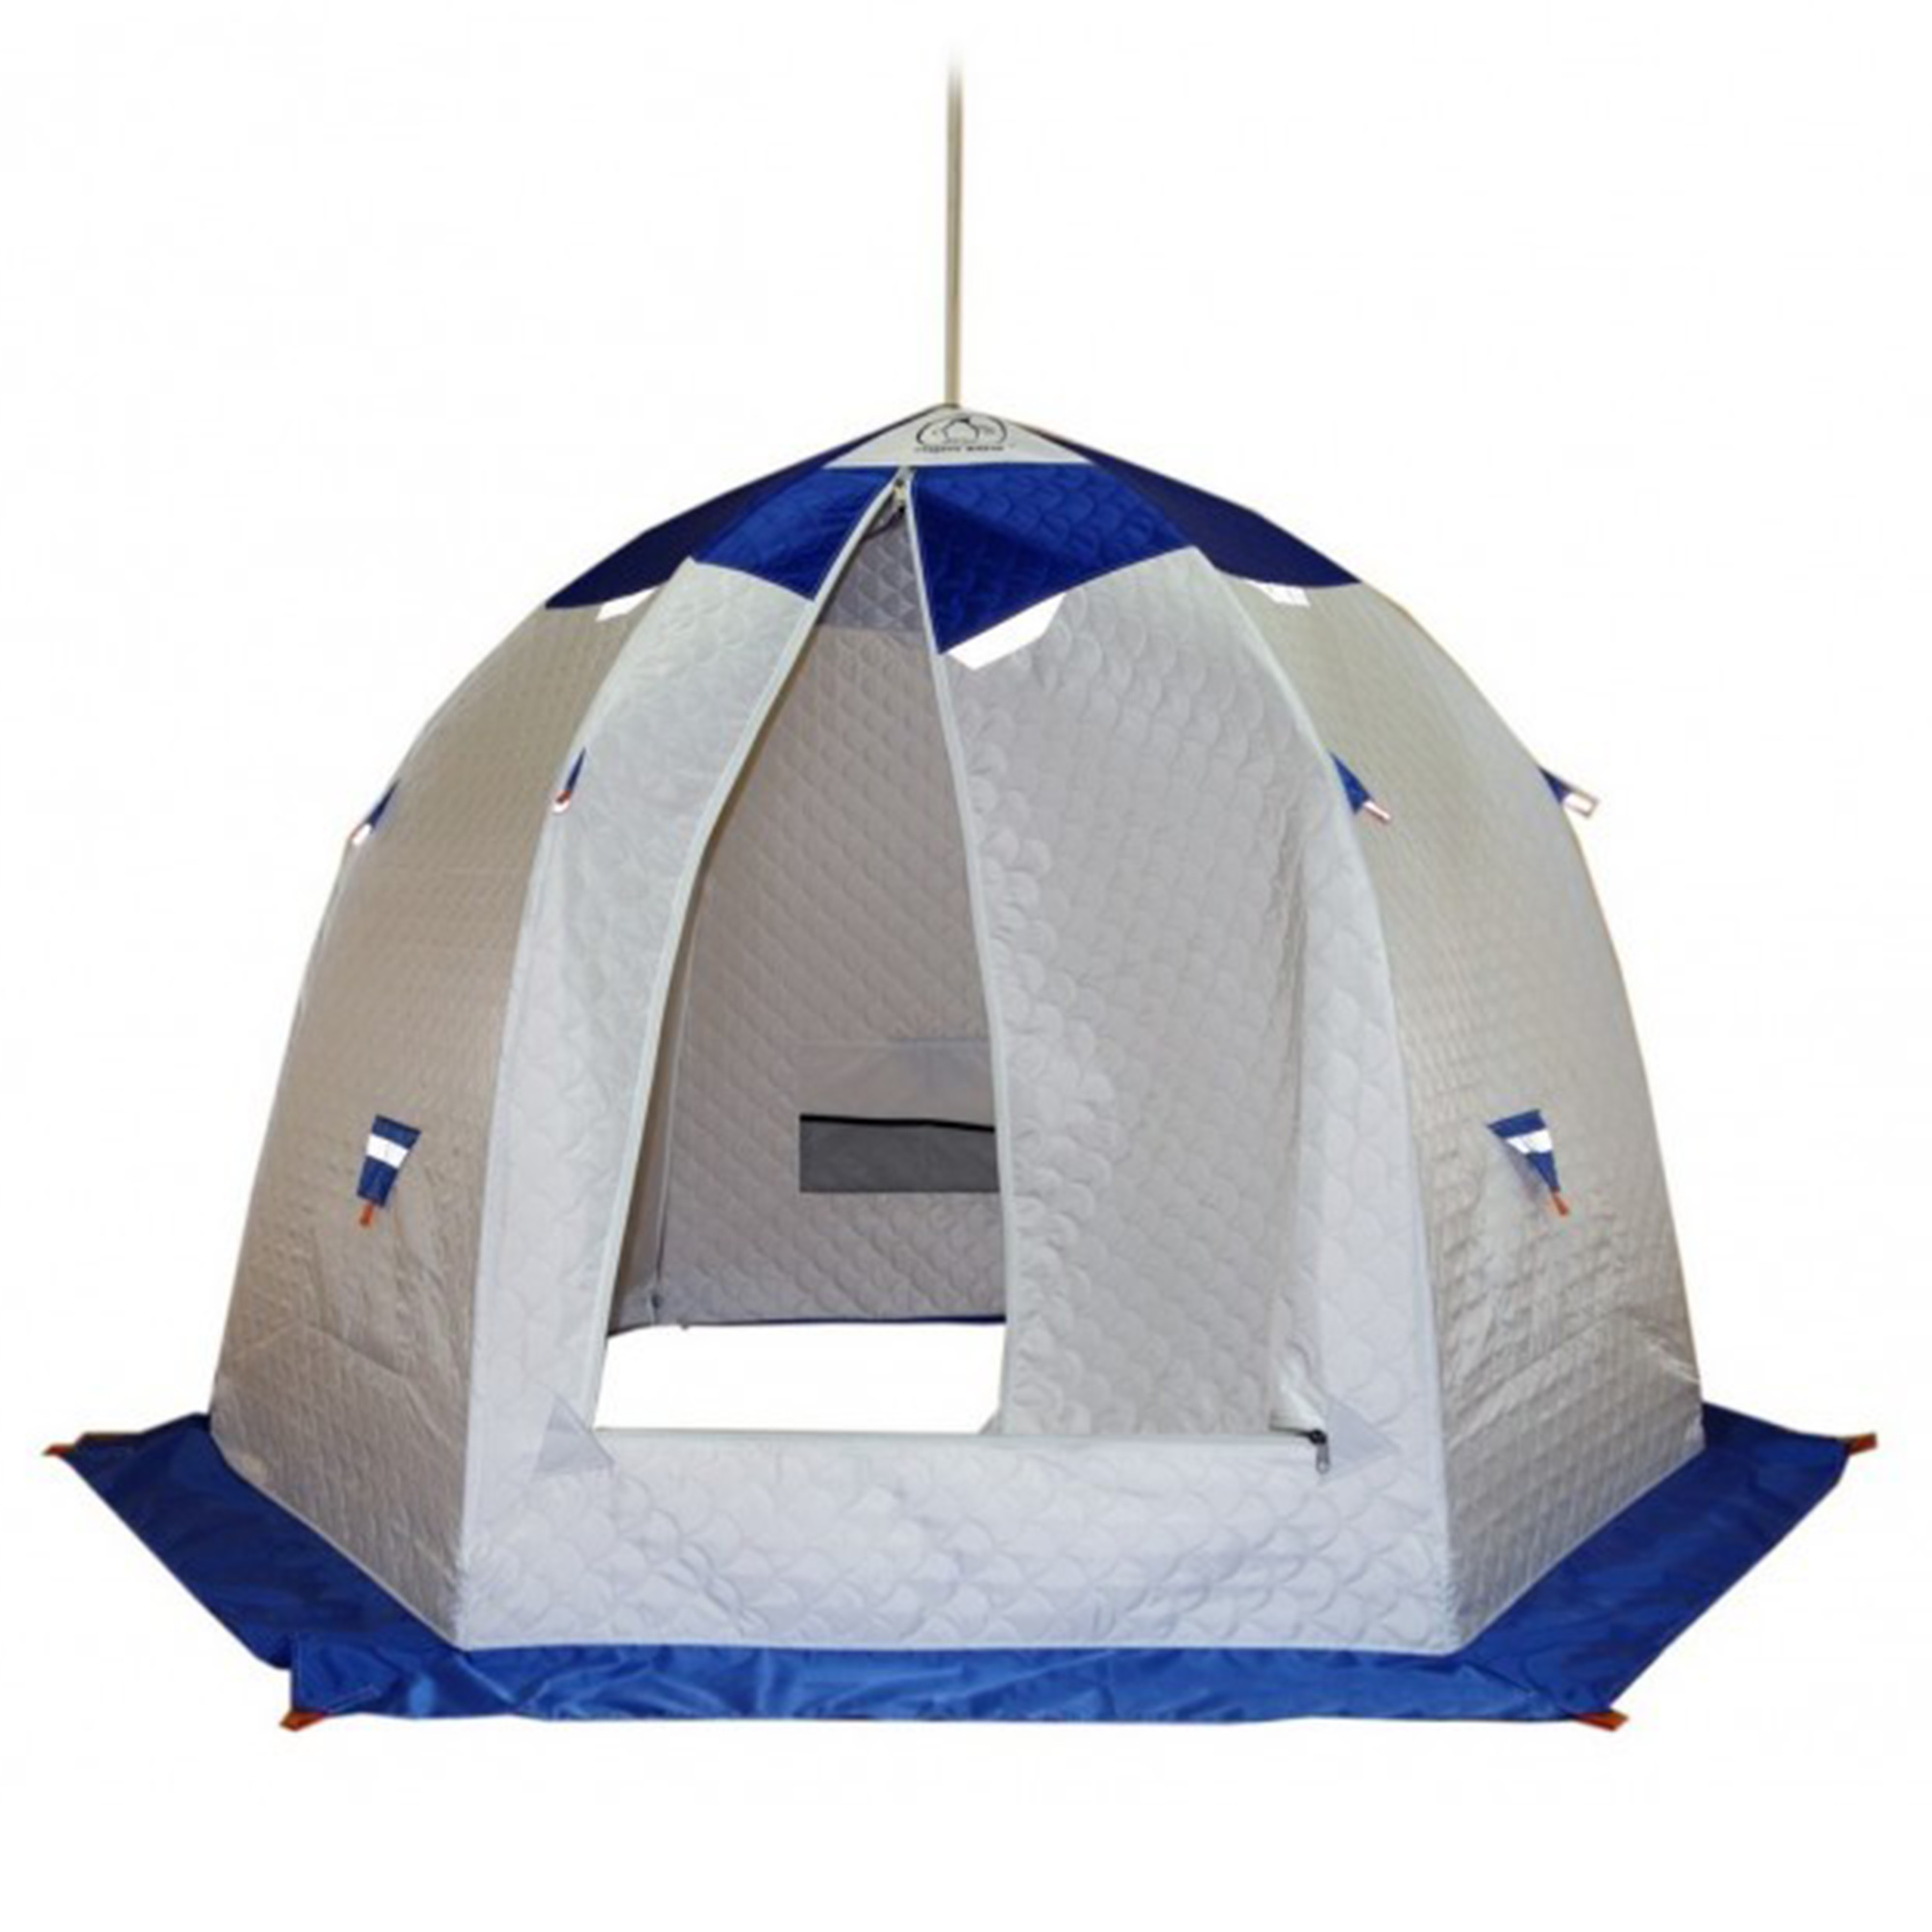 Палатка-зонт ПИНГВИН Пингвин 3 Термолайт, Палатки - арт. 1128400162